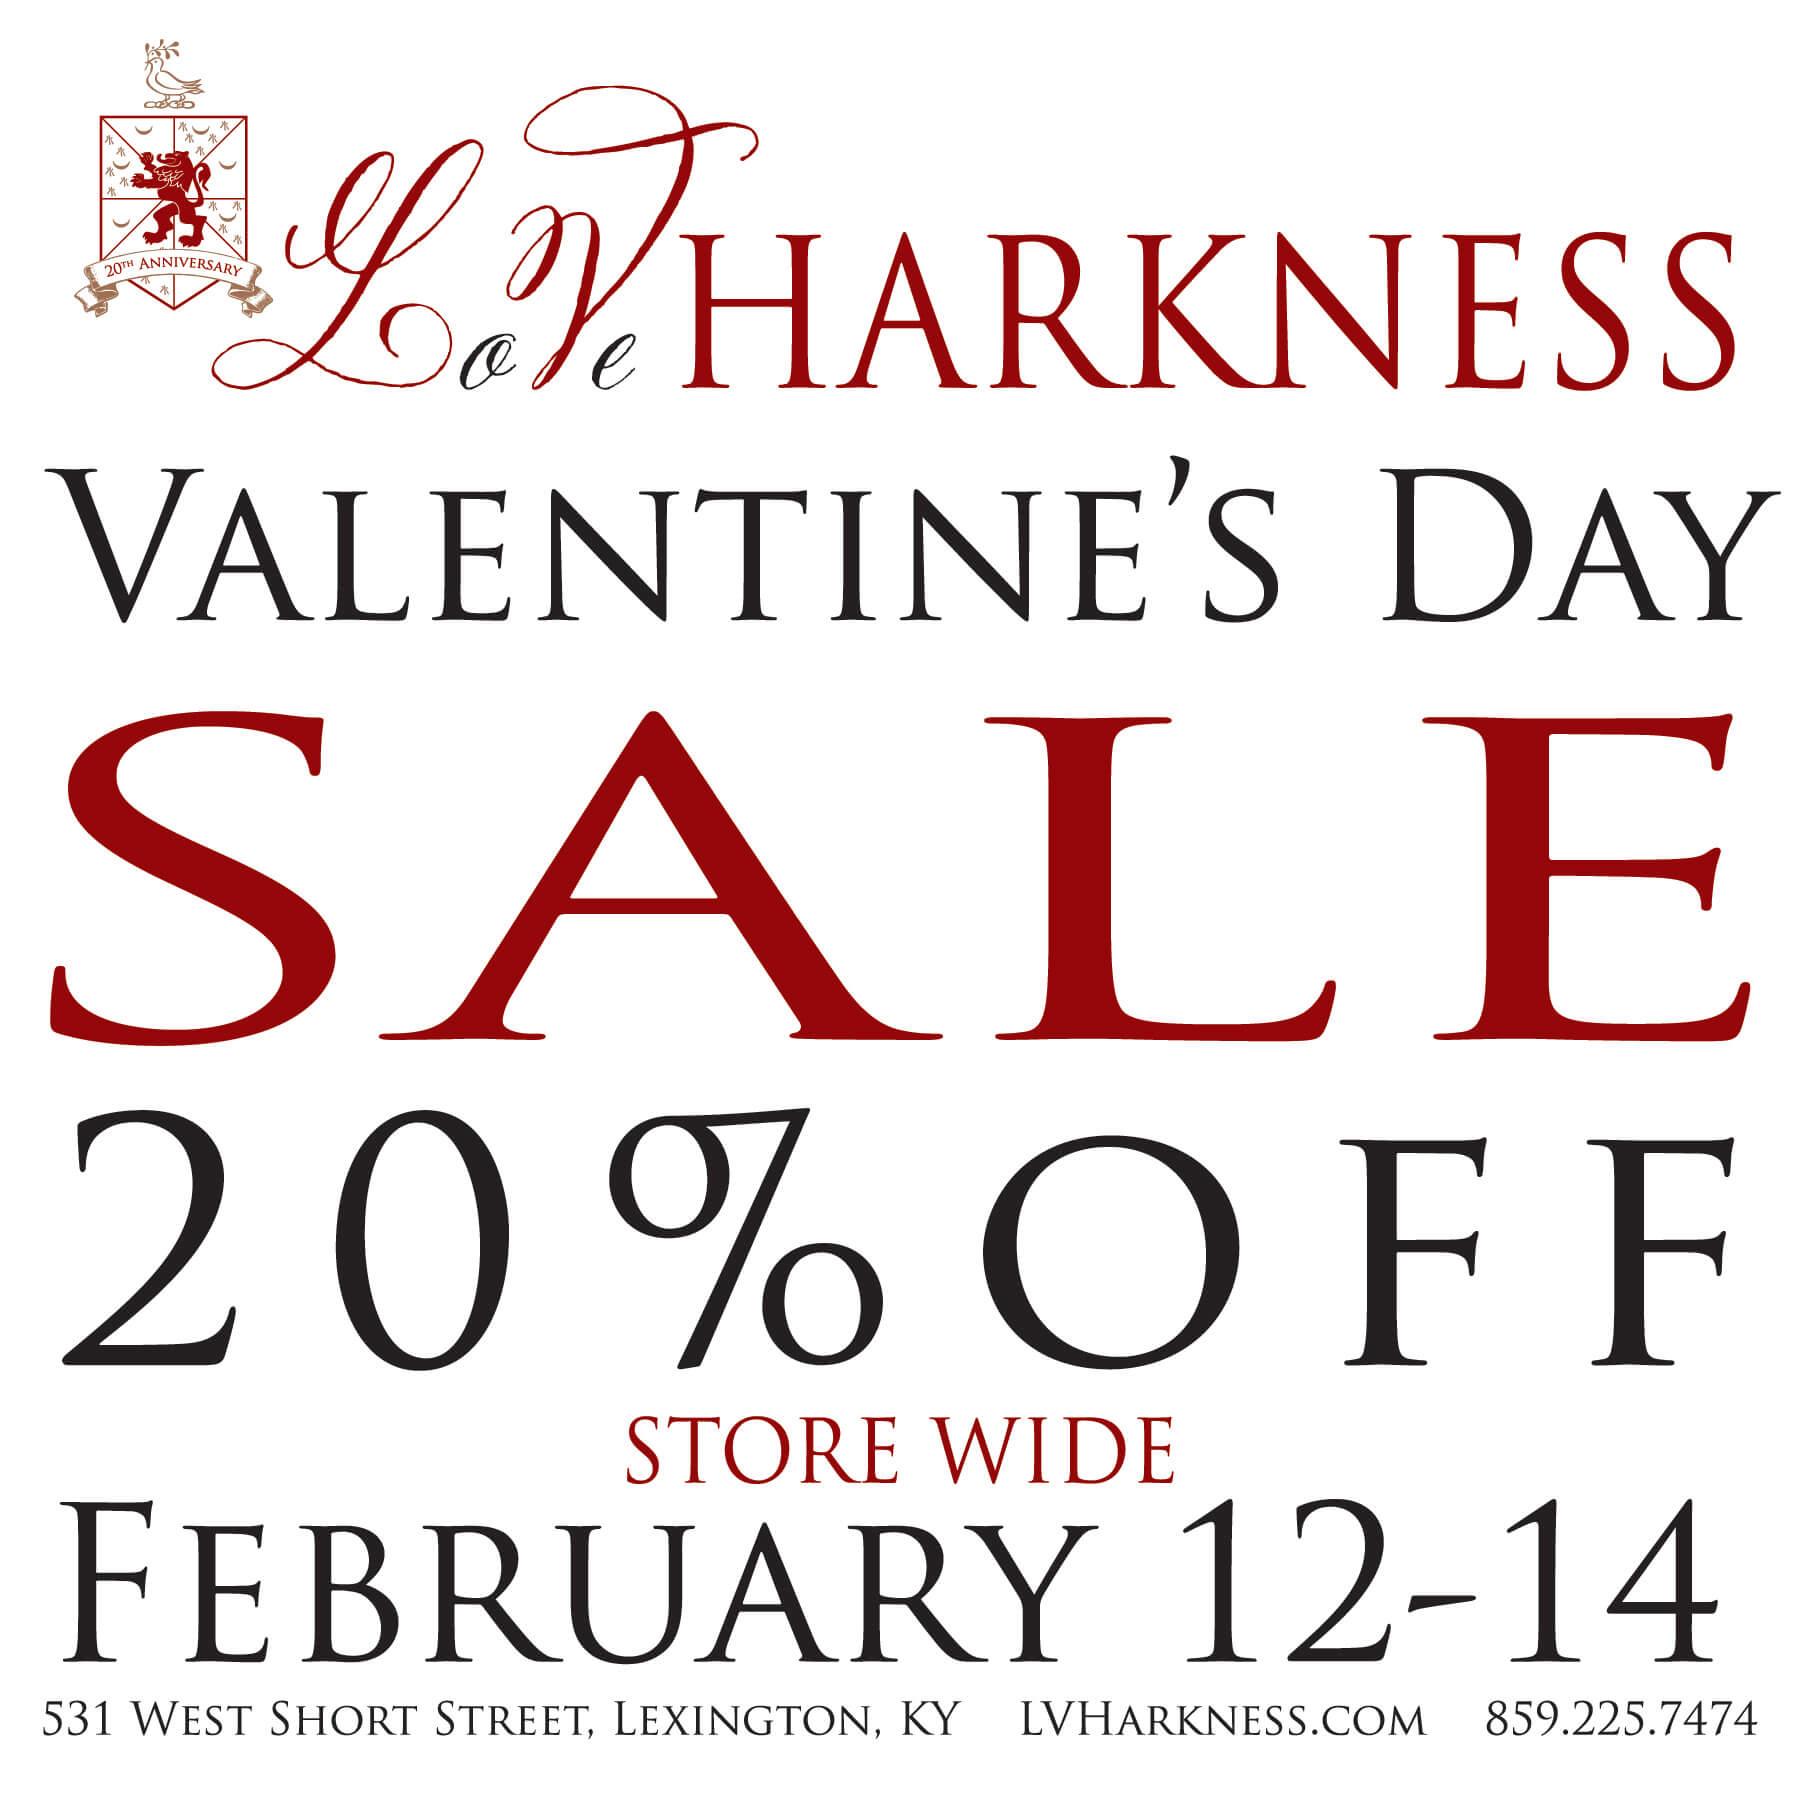 L.V. Harkness Valentine's Day Sale